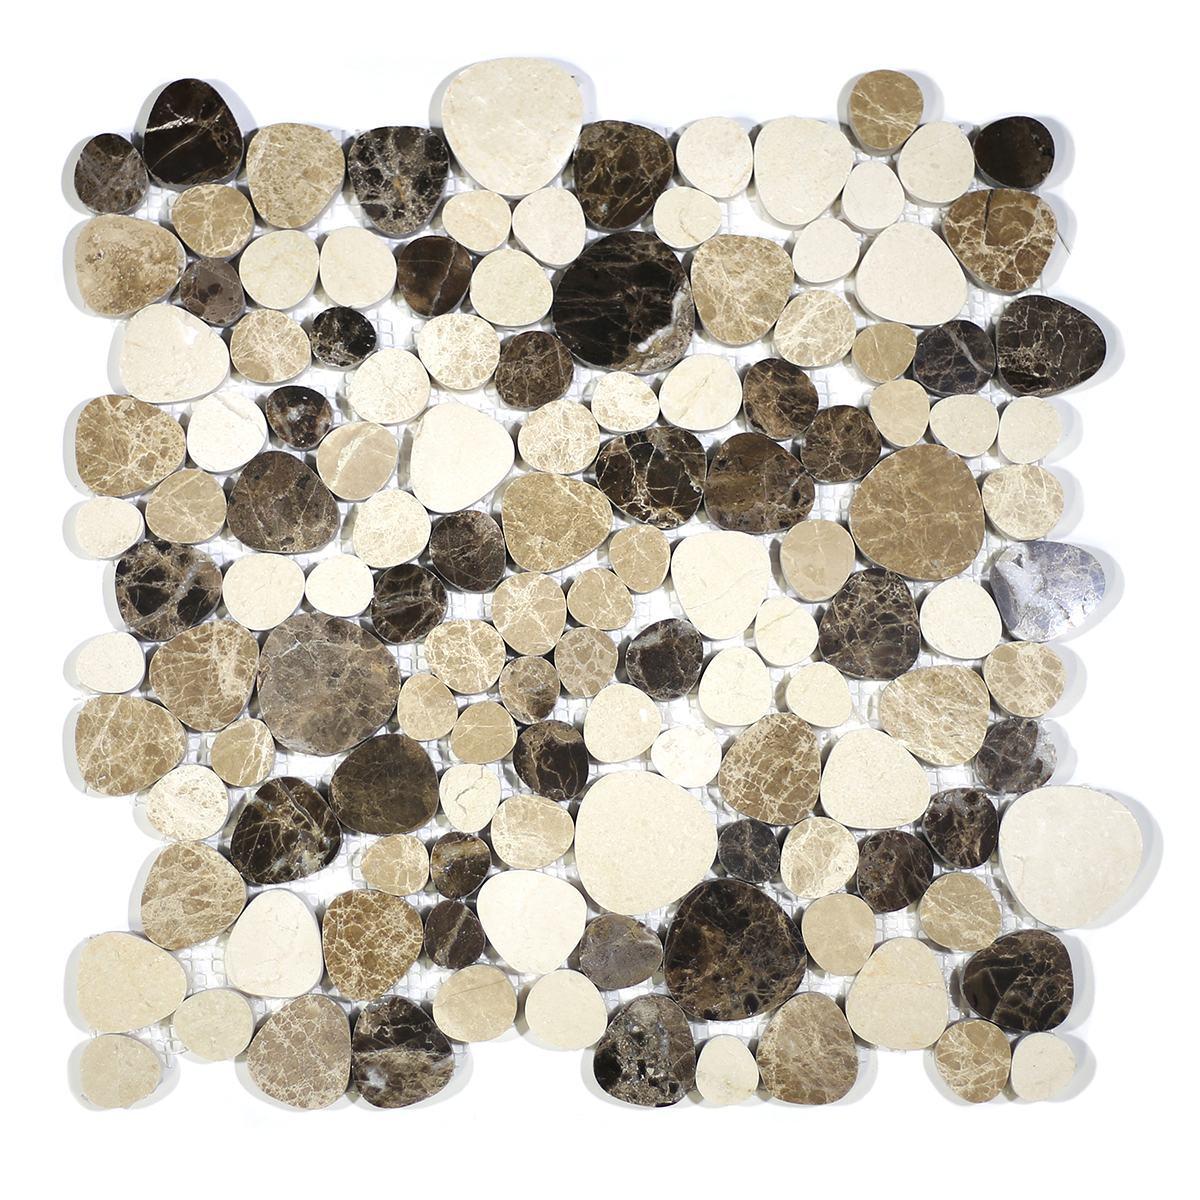 MA241-PB  Pebbles Crema Marfil, Emparador Polished